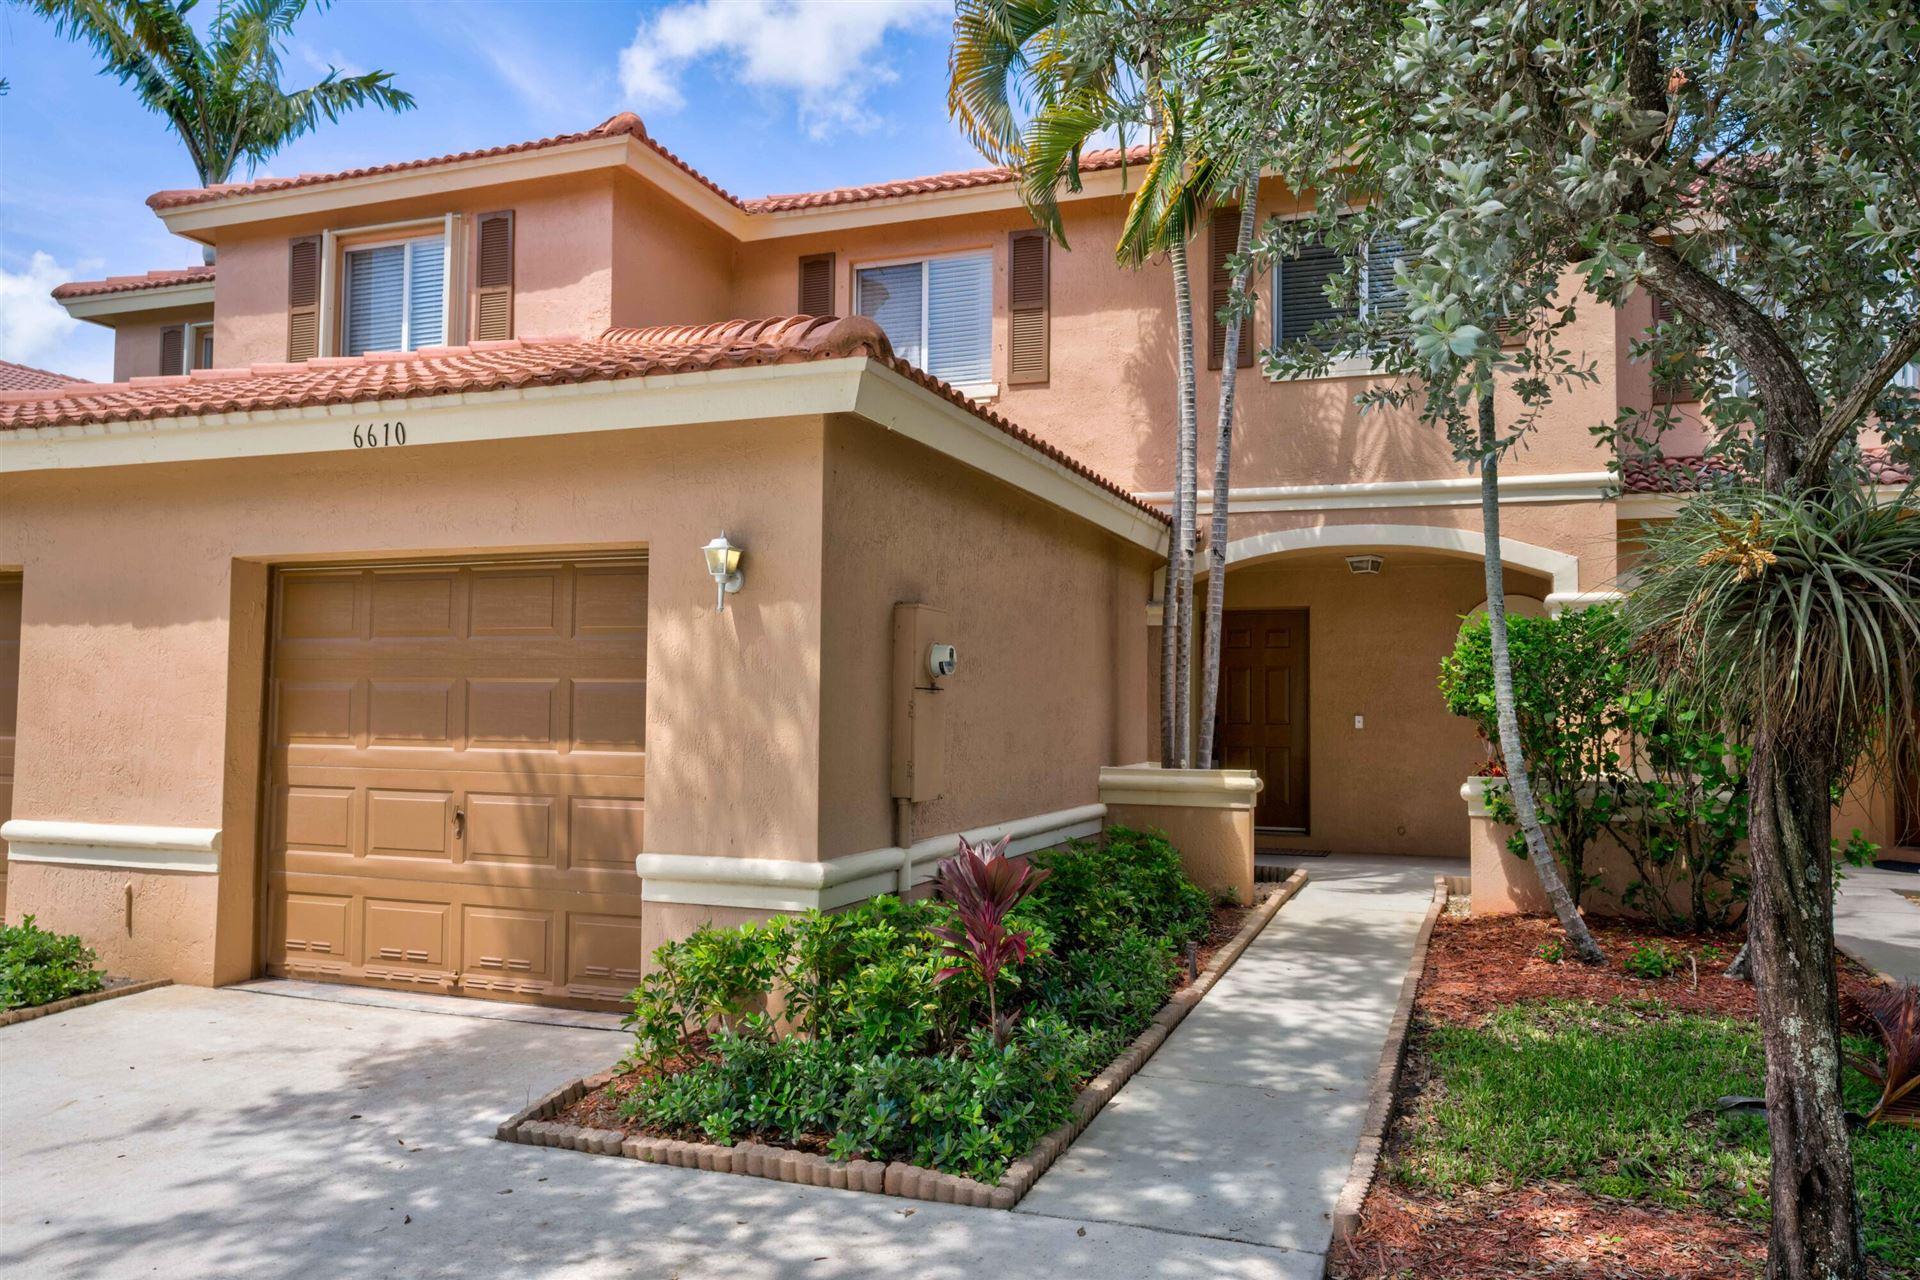 6610 Sandy Bank Terrace, Riviera Beach, FL 33407 - MLS#: RX-10745638